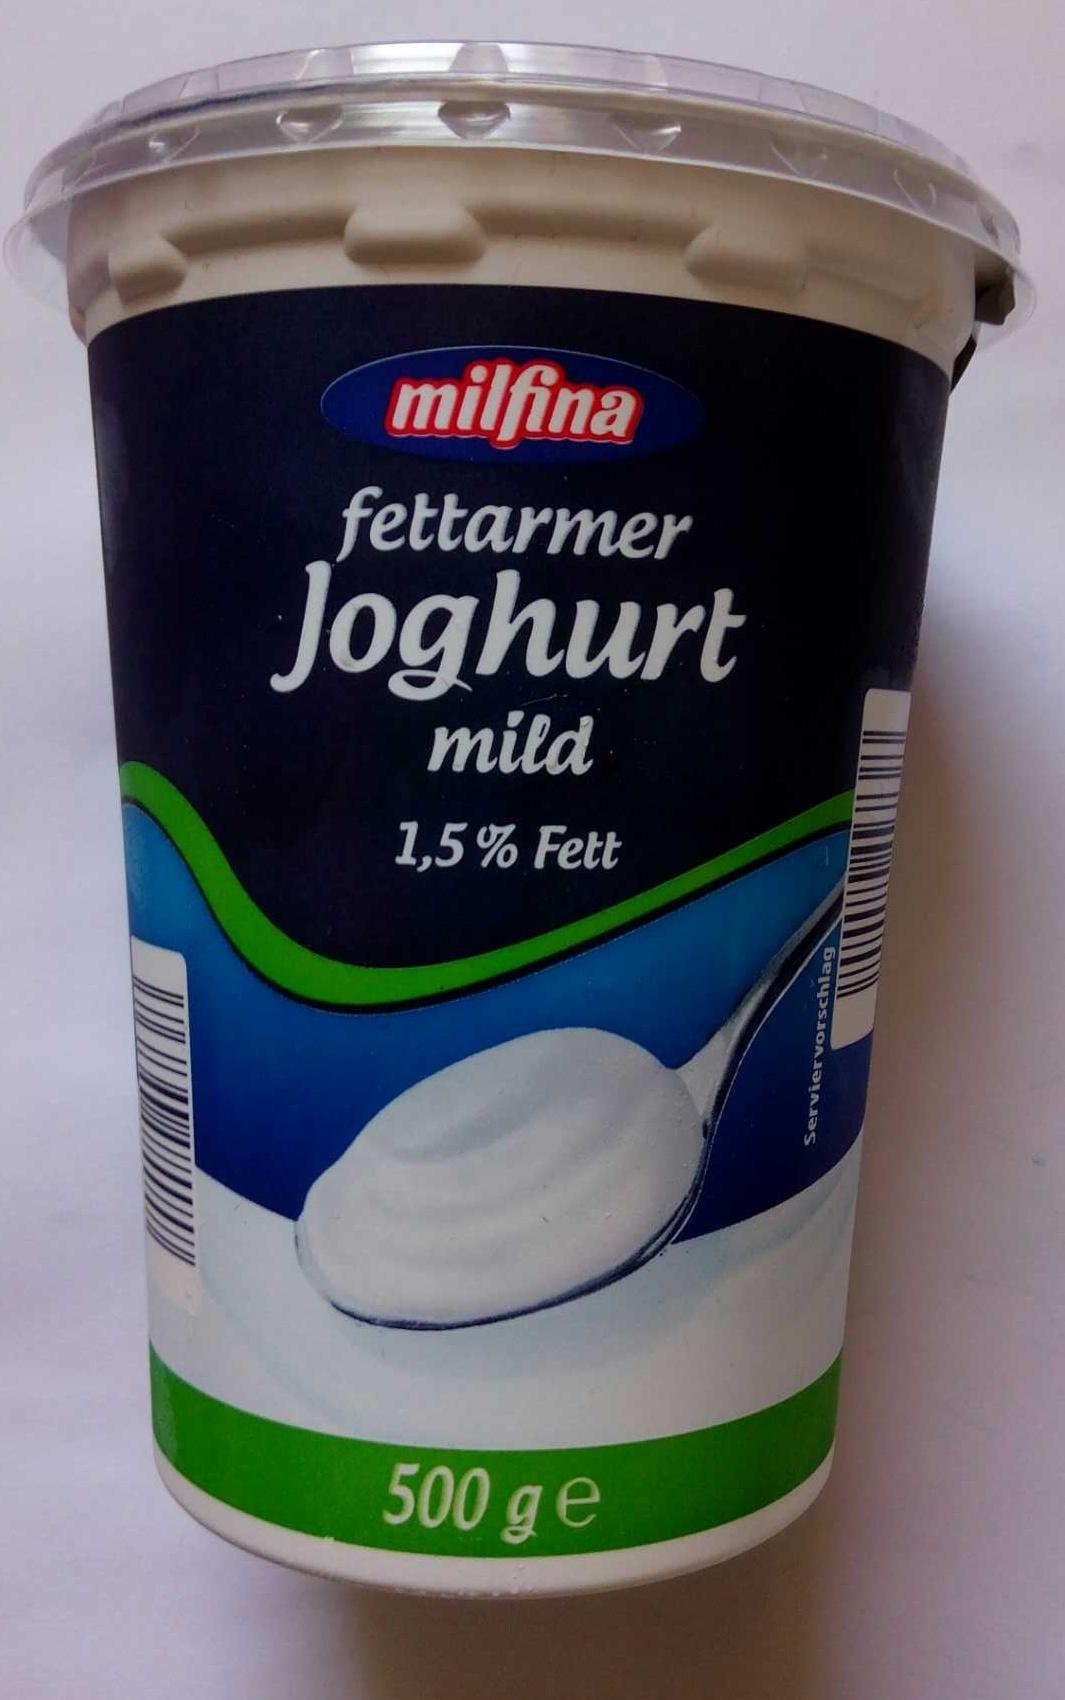 fettarmer joghurt mild 1 5 fett milfina 500 g. Black Bedroom Furniture Sets. Home Design Ideas